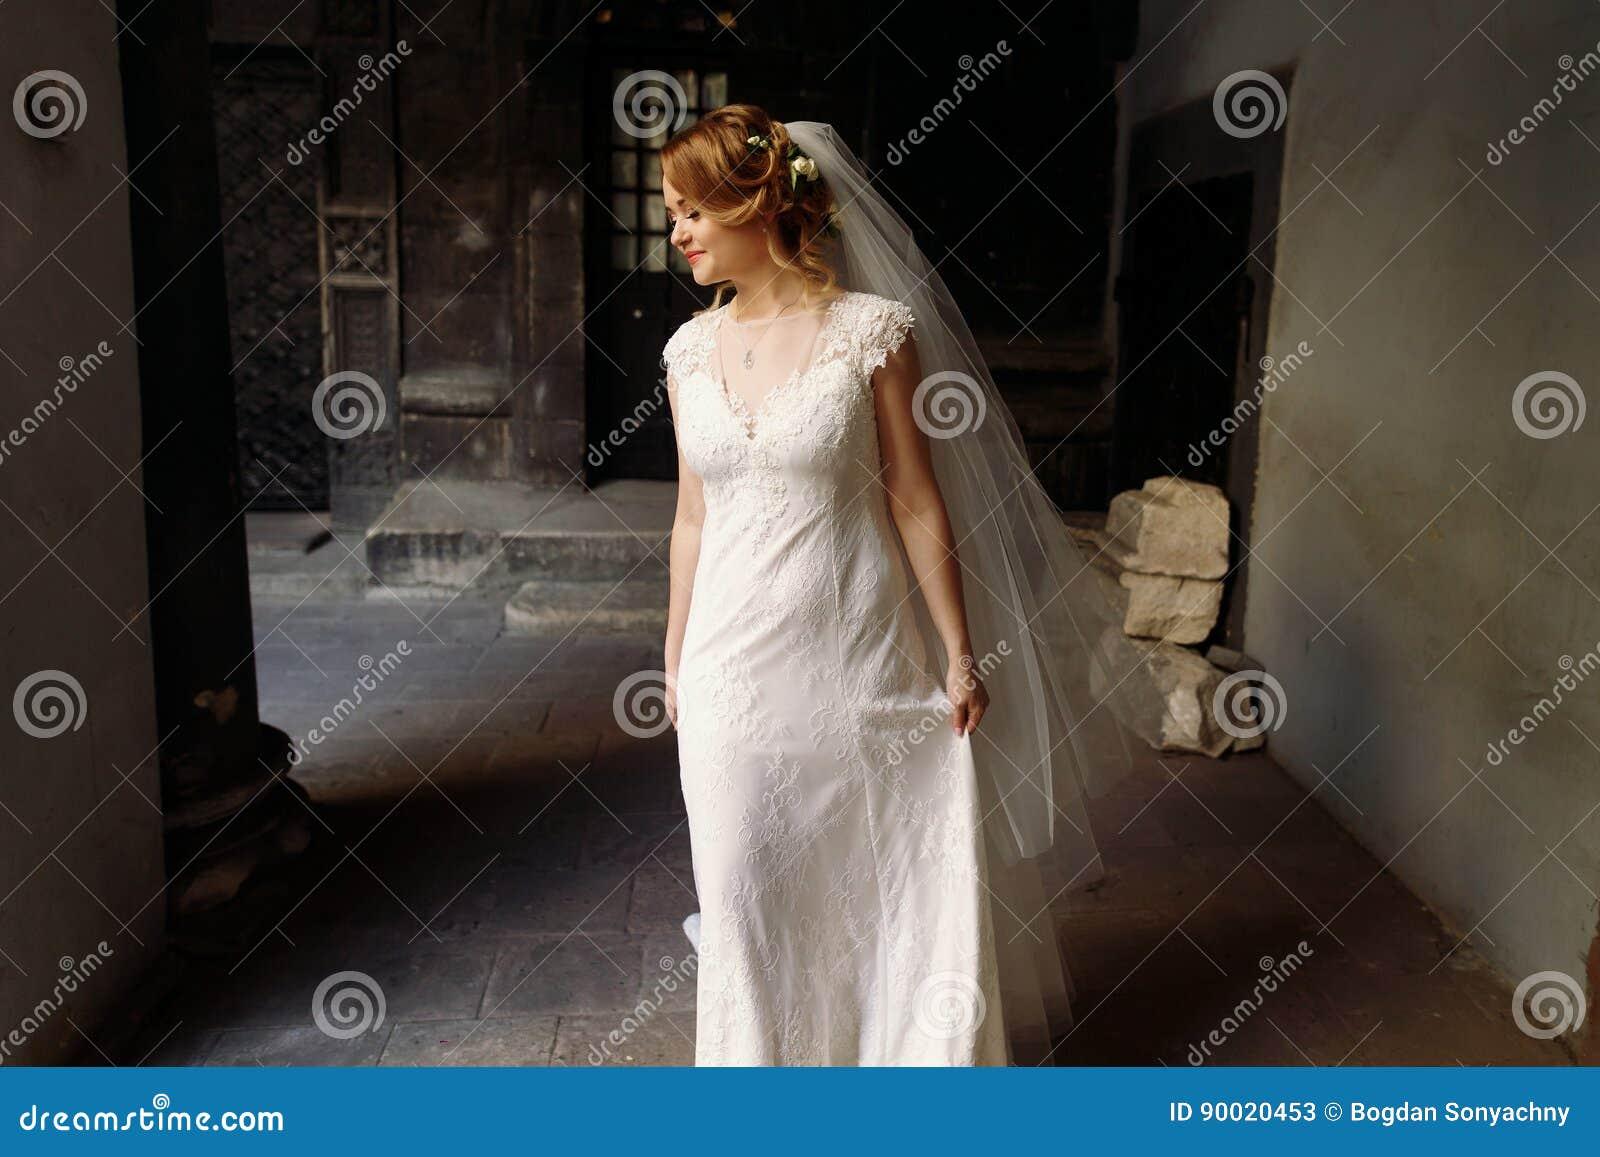 Exquisite European Wedding Dresses Elegant Mother Of The: Beautiful Blonde Bride In Elegant White Wedding Dress